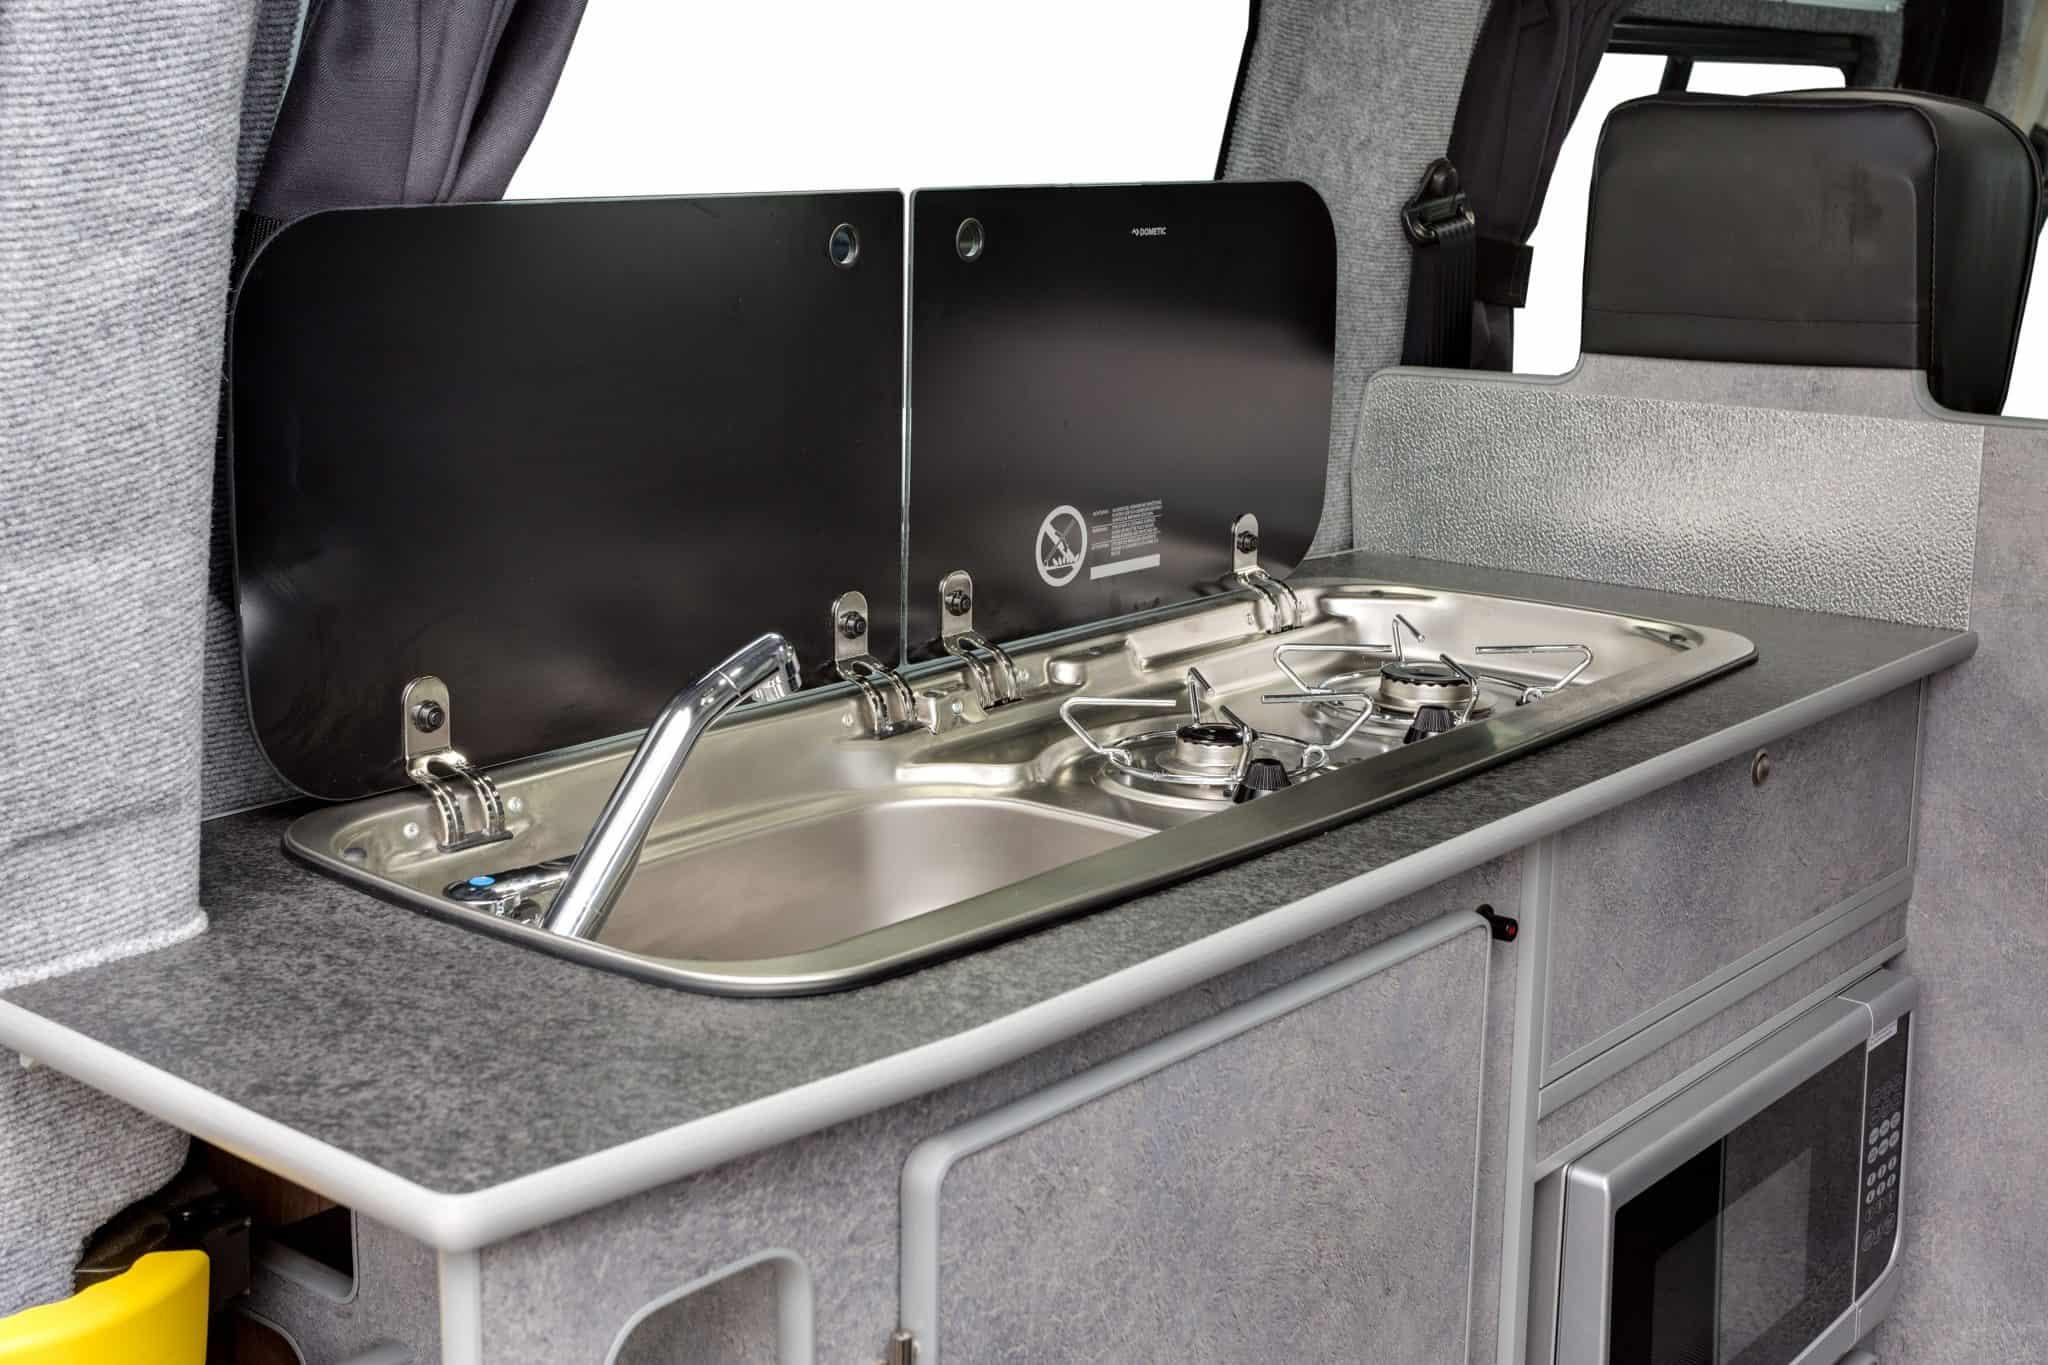 Ford Occasion Campervans for Sale, Ford Occasion Campervans for Sale, Leisuredrive